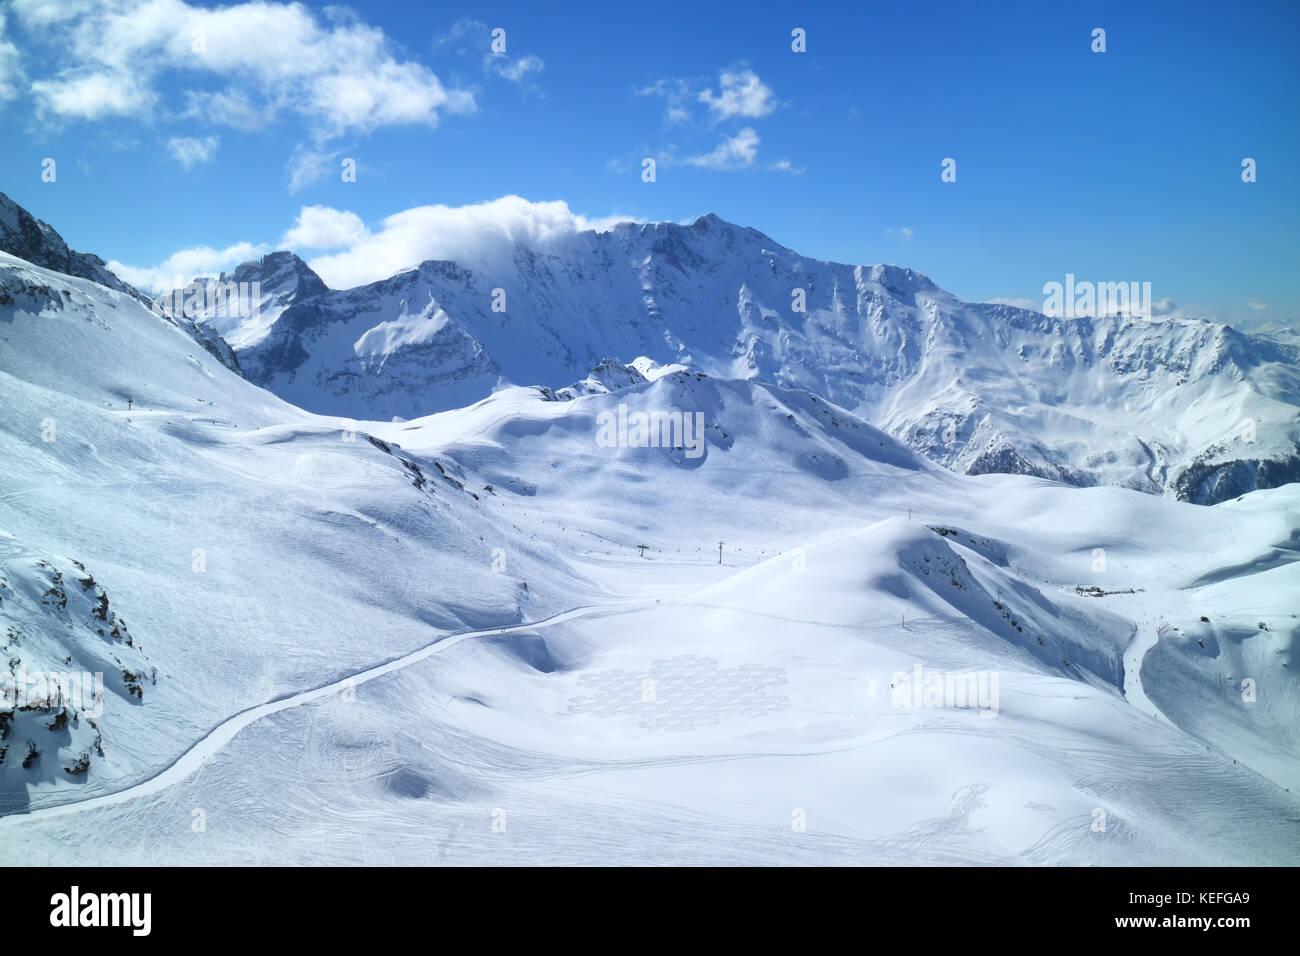 Winter mountain panorama with fresh snow on skiing tracks, Meribel slopes, 3 Valleys resort, Alps, France - Stock Image